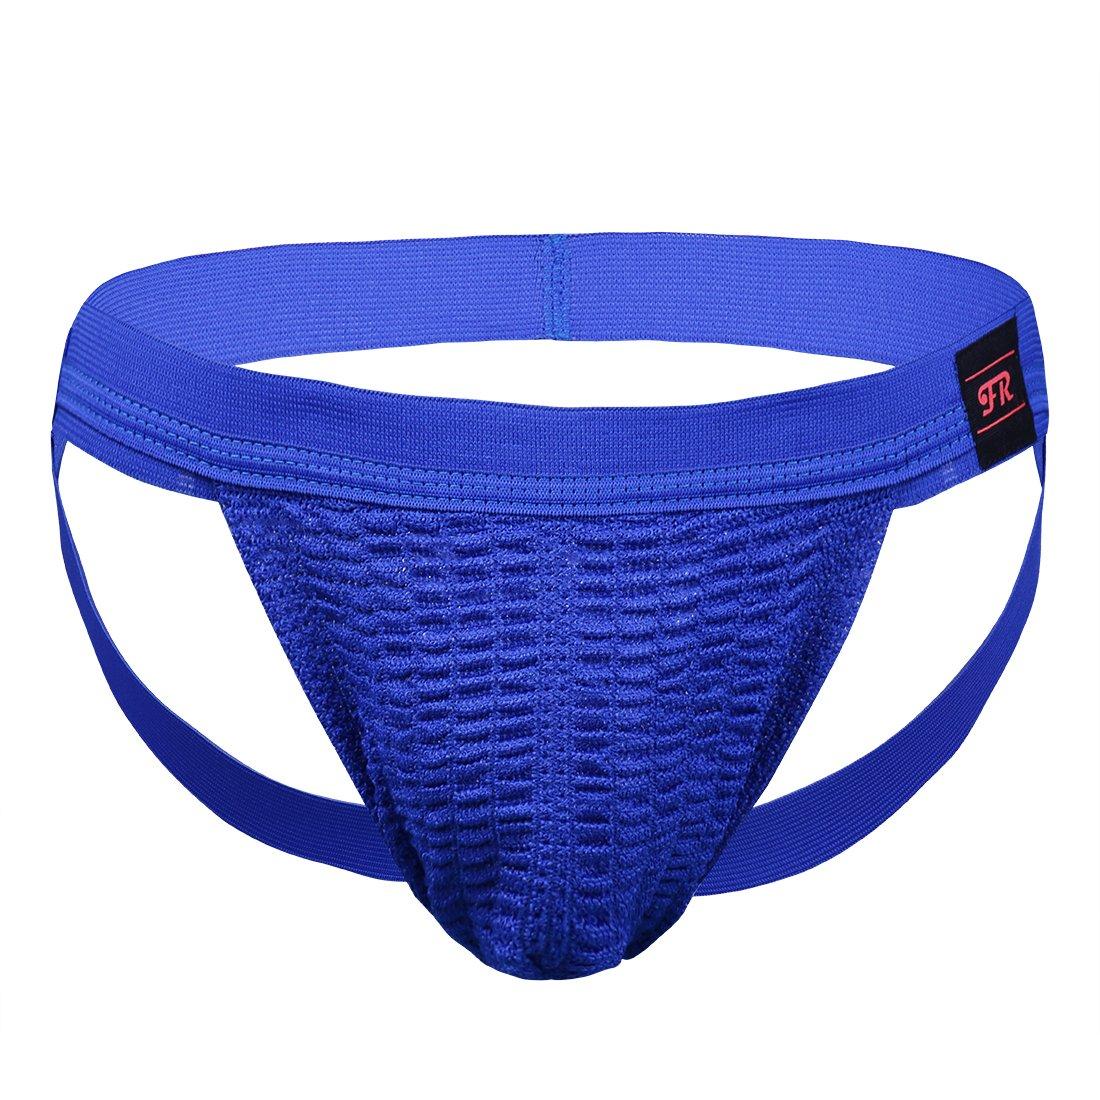 Freebily Man's Athletic Supporter Jockstrap Thongs Sports Briefs Underwear # Blue Large(Waist:32.0-47.0''/82-102cm)